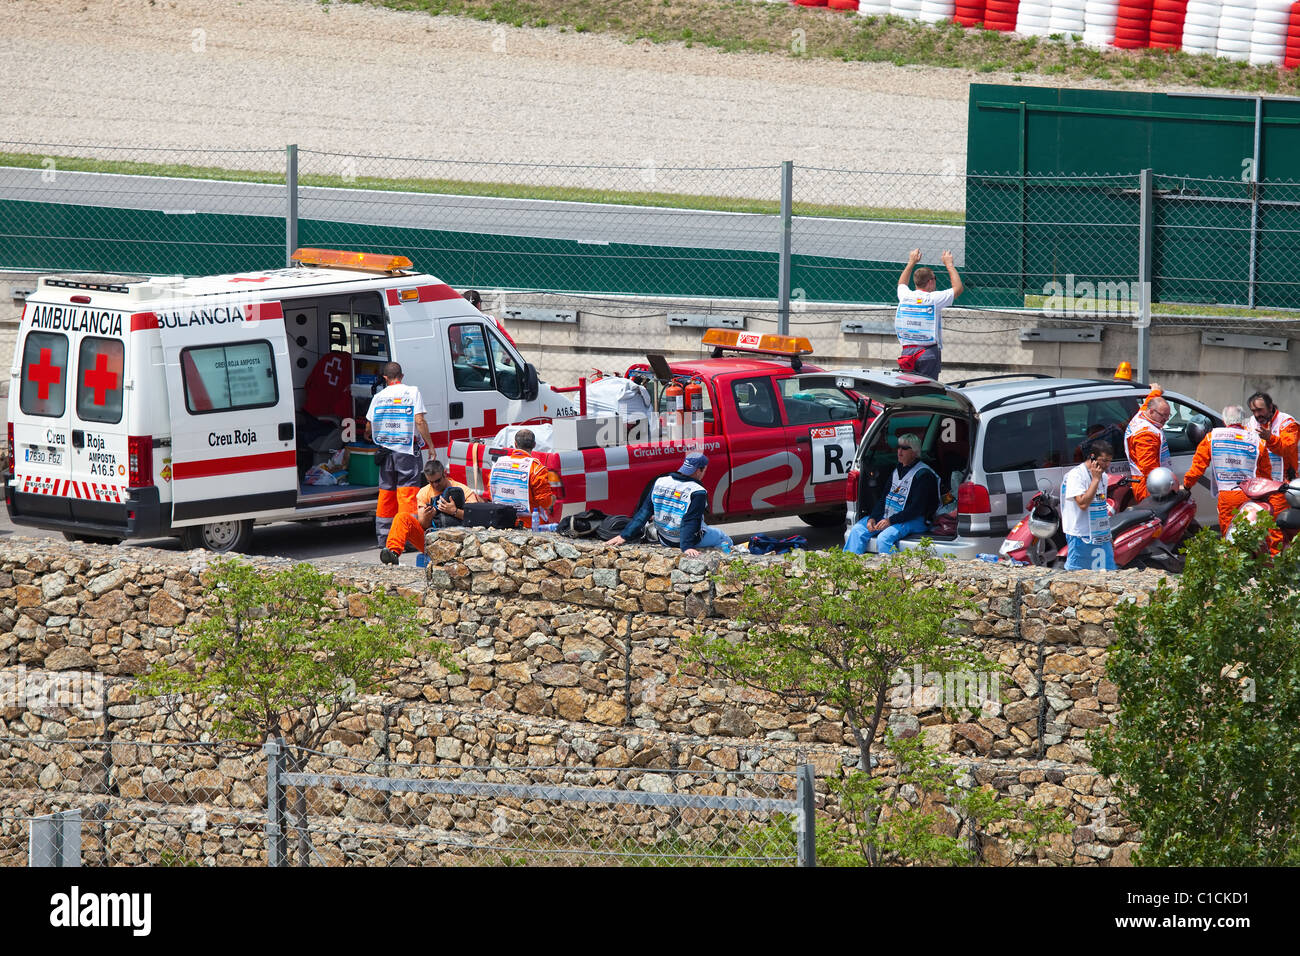 "Die Formel 1 Grand Prix im Autodrom ""Catalunya Montmello"" am 9. Mai 2010 in Barcelona. Stockbild"